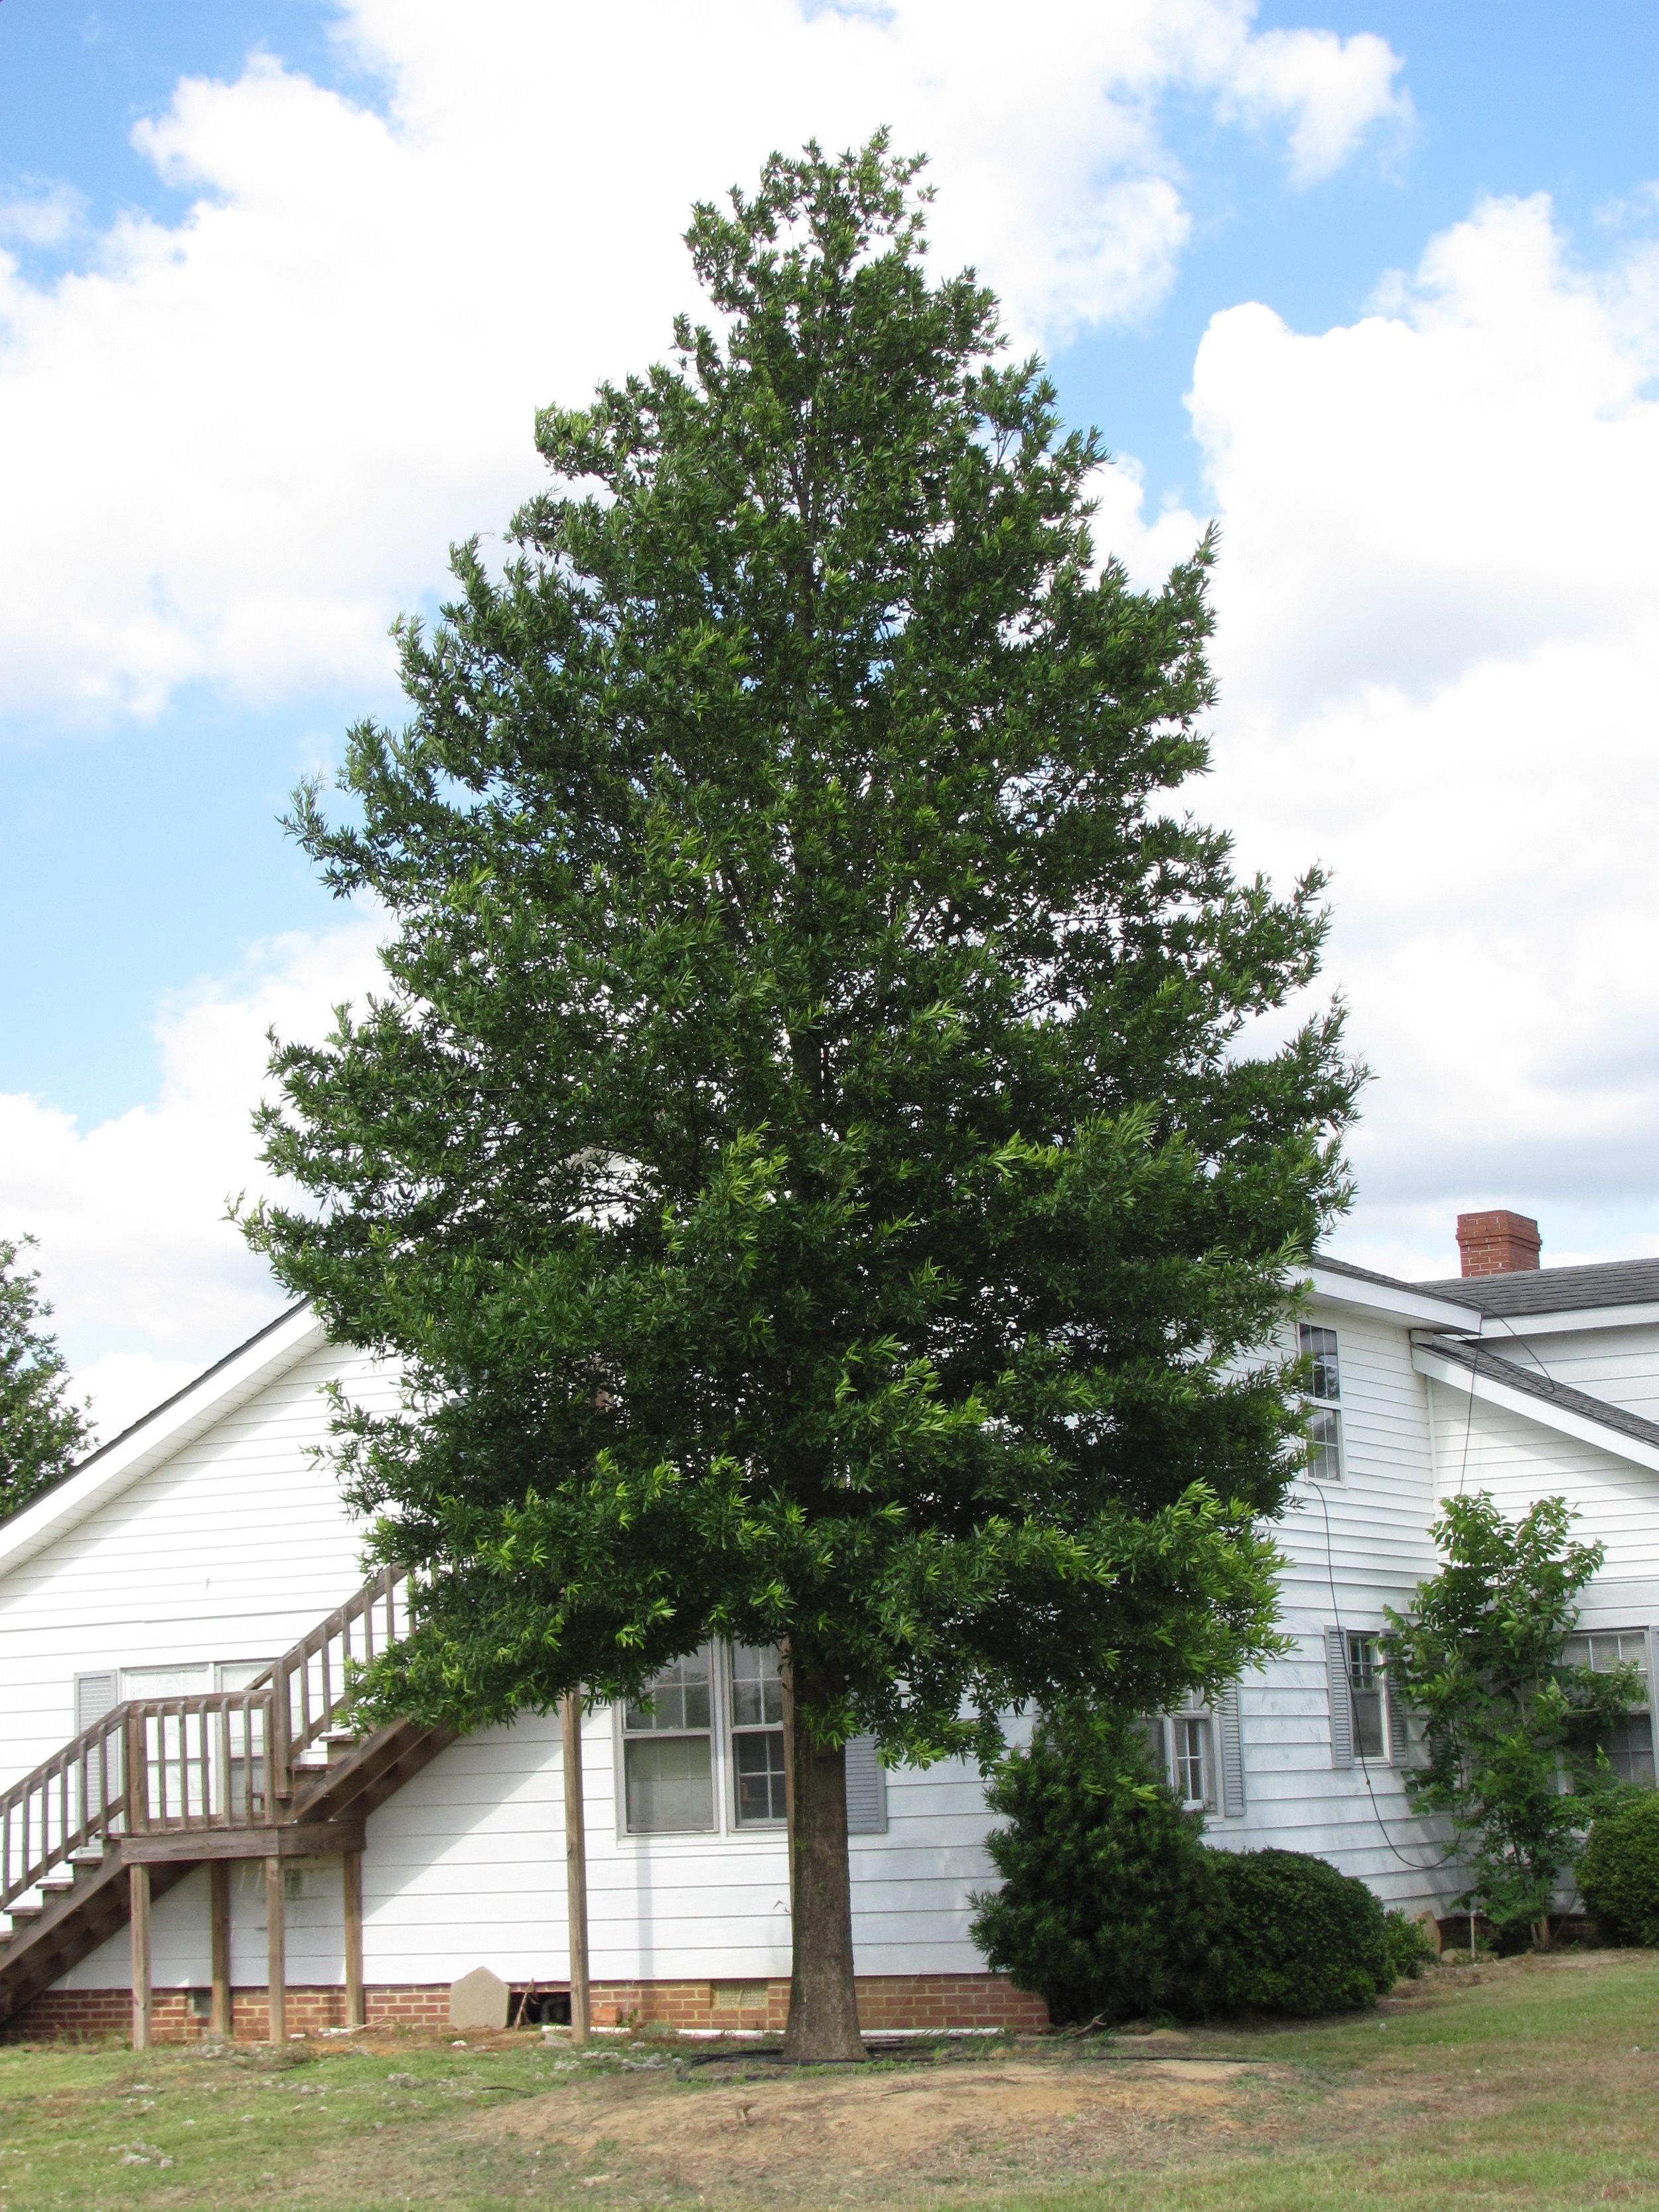 Kingpin-Willow-Oak-Quercus-phellos-habit-3.jpg